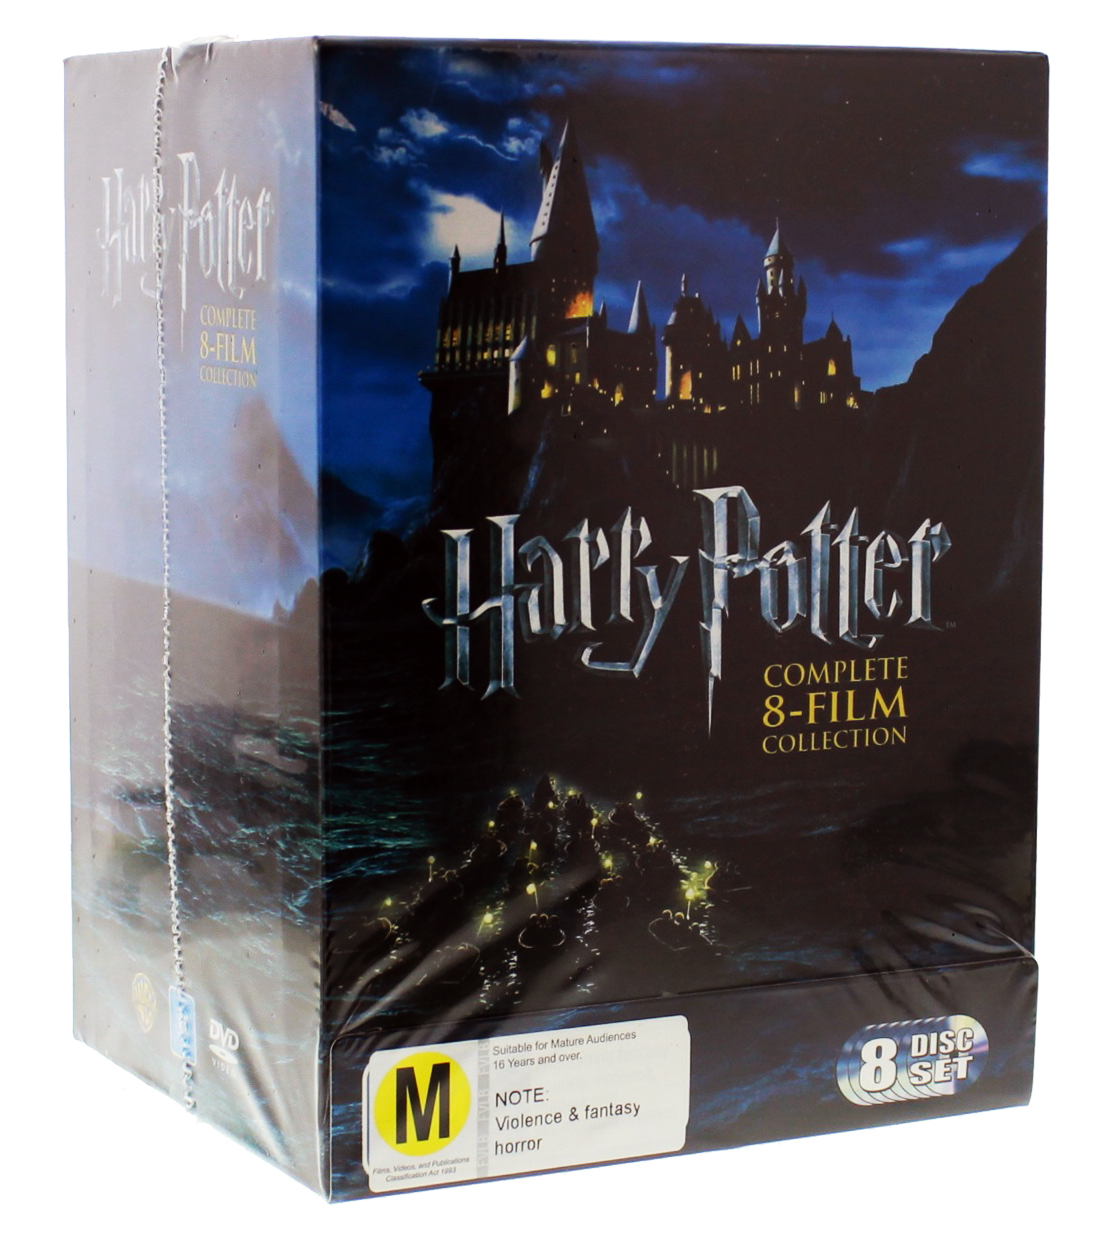 Harry Potter Book Box Set Australia : Harry potter complete film collection box set dvd